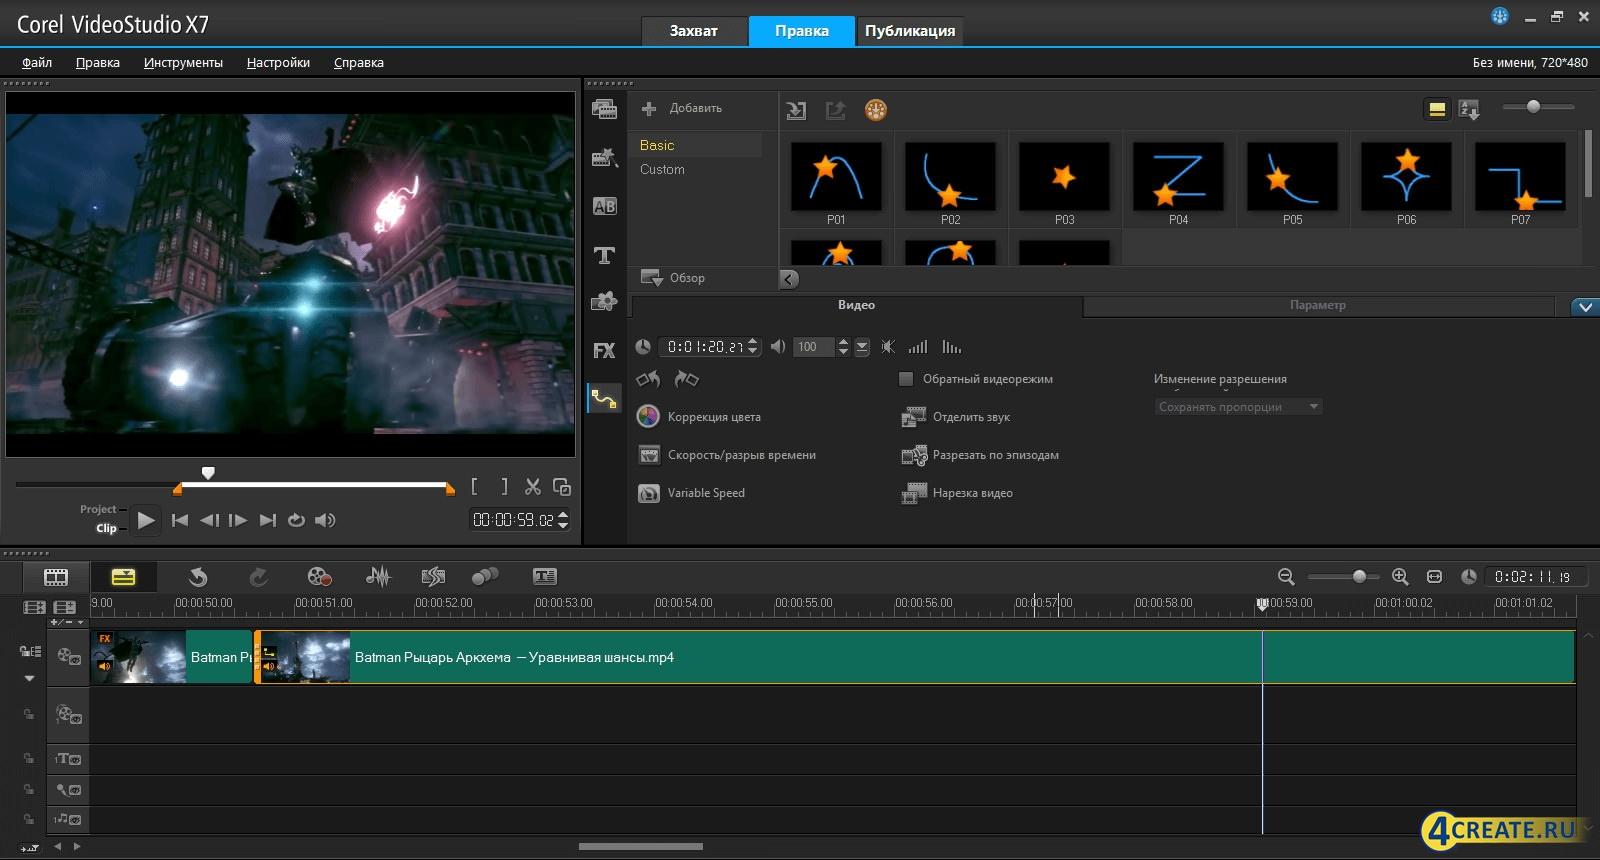 Corel VideoStudio Pro X9 (Скриншот 1)